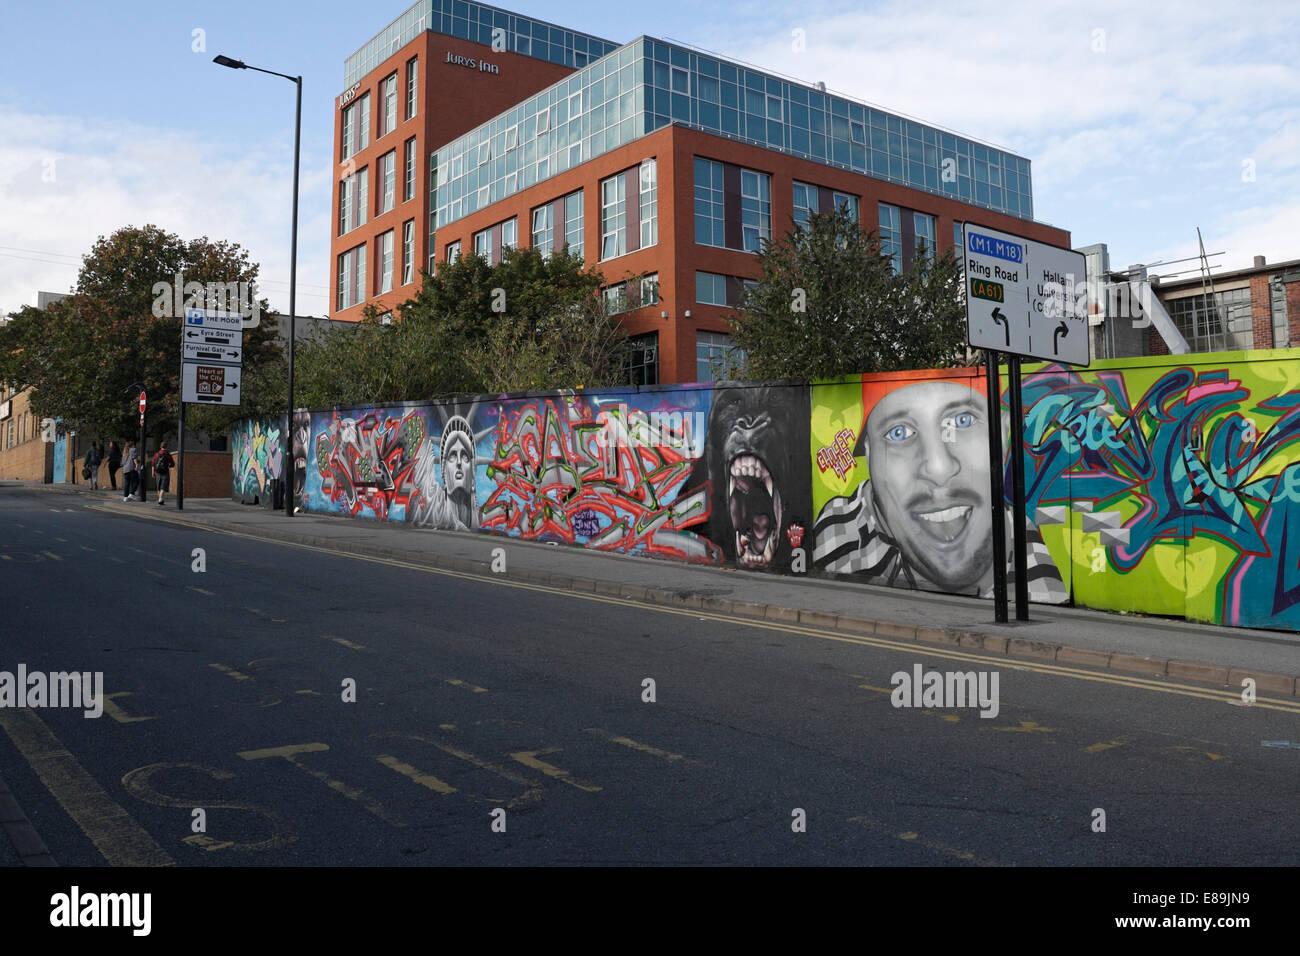 Straße Kunst Wandbild auf Matilda Street Sheffield, Baustelle Stockbild